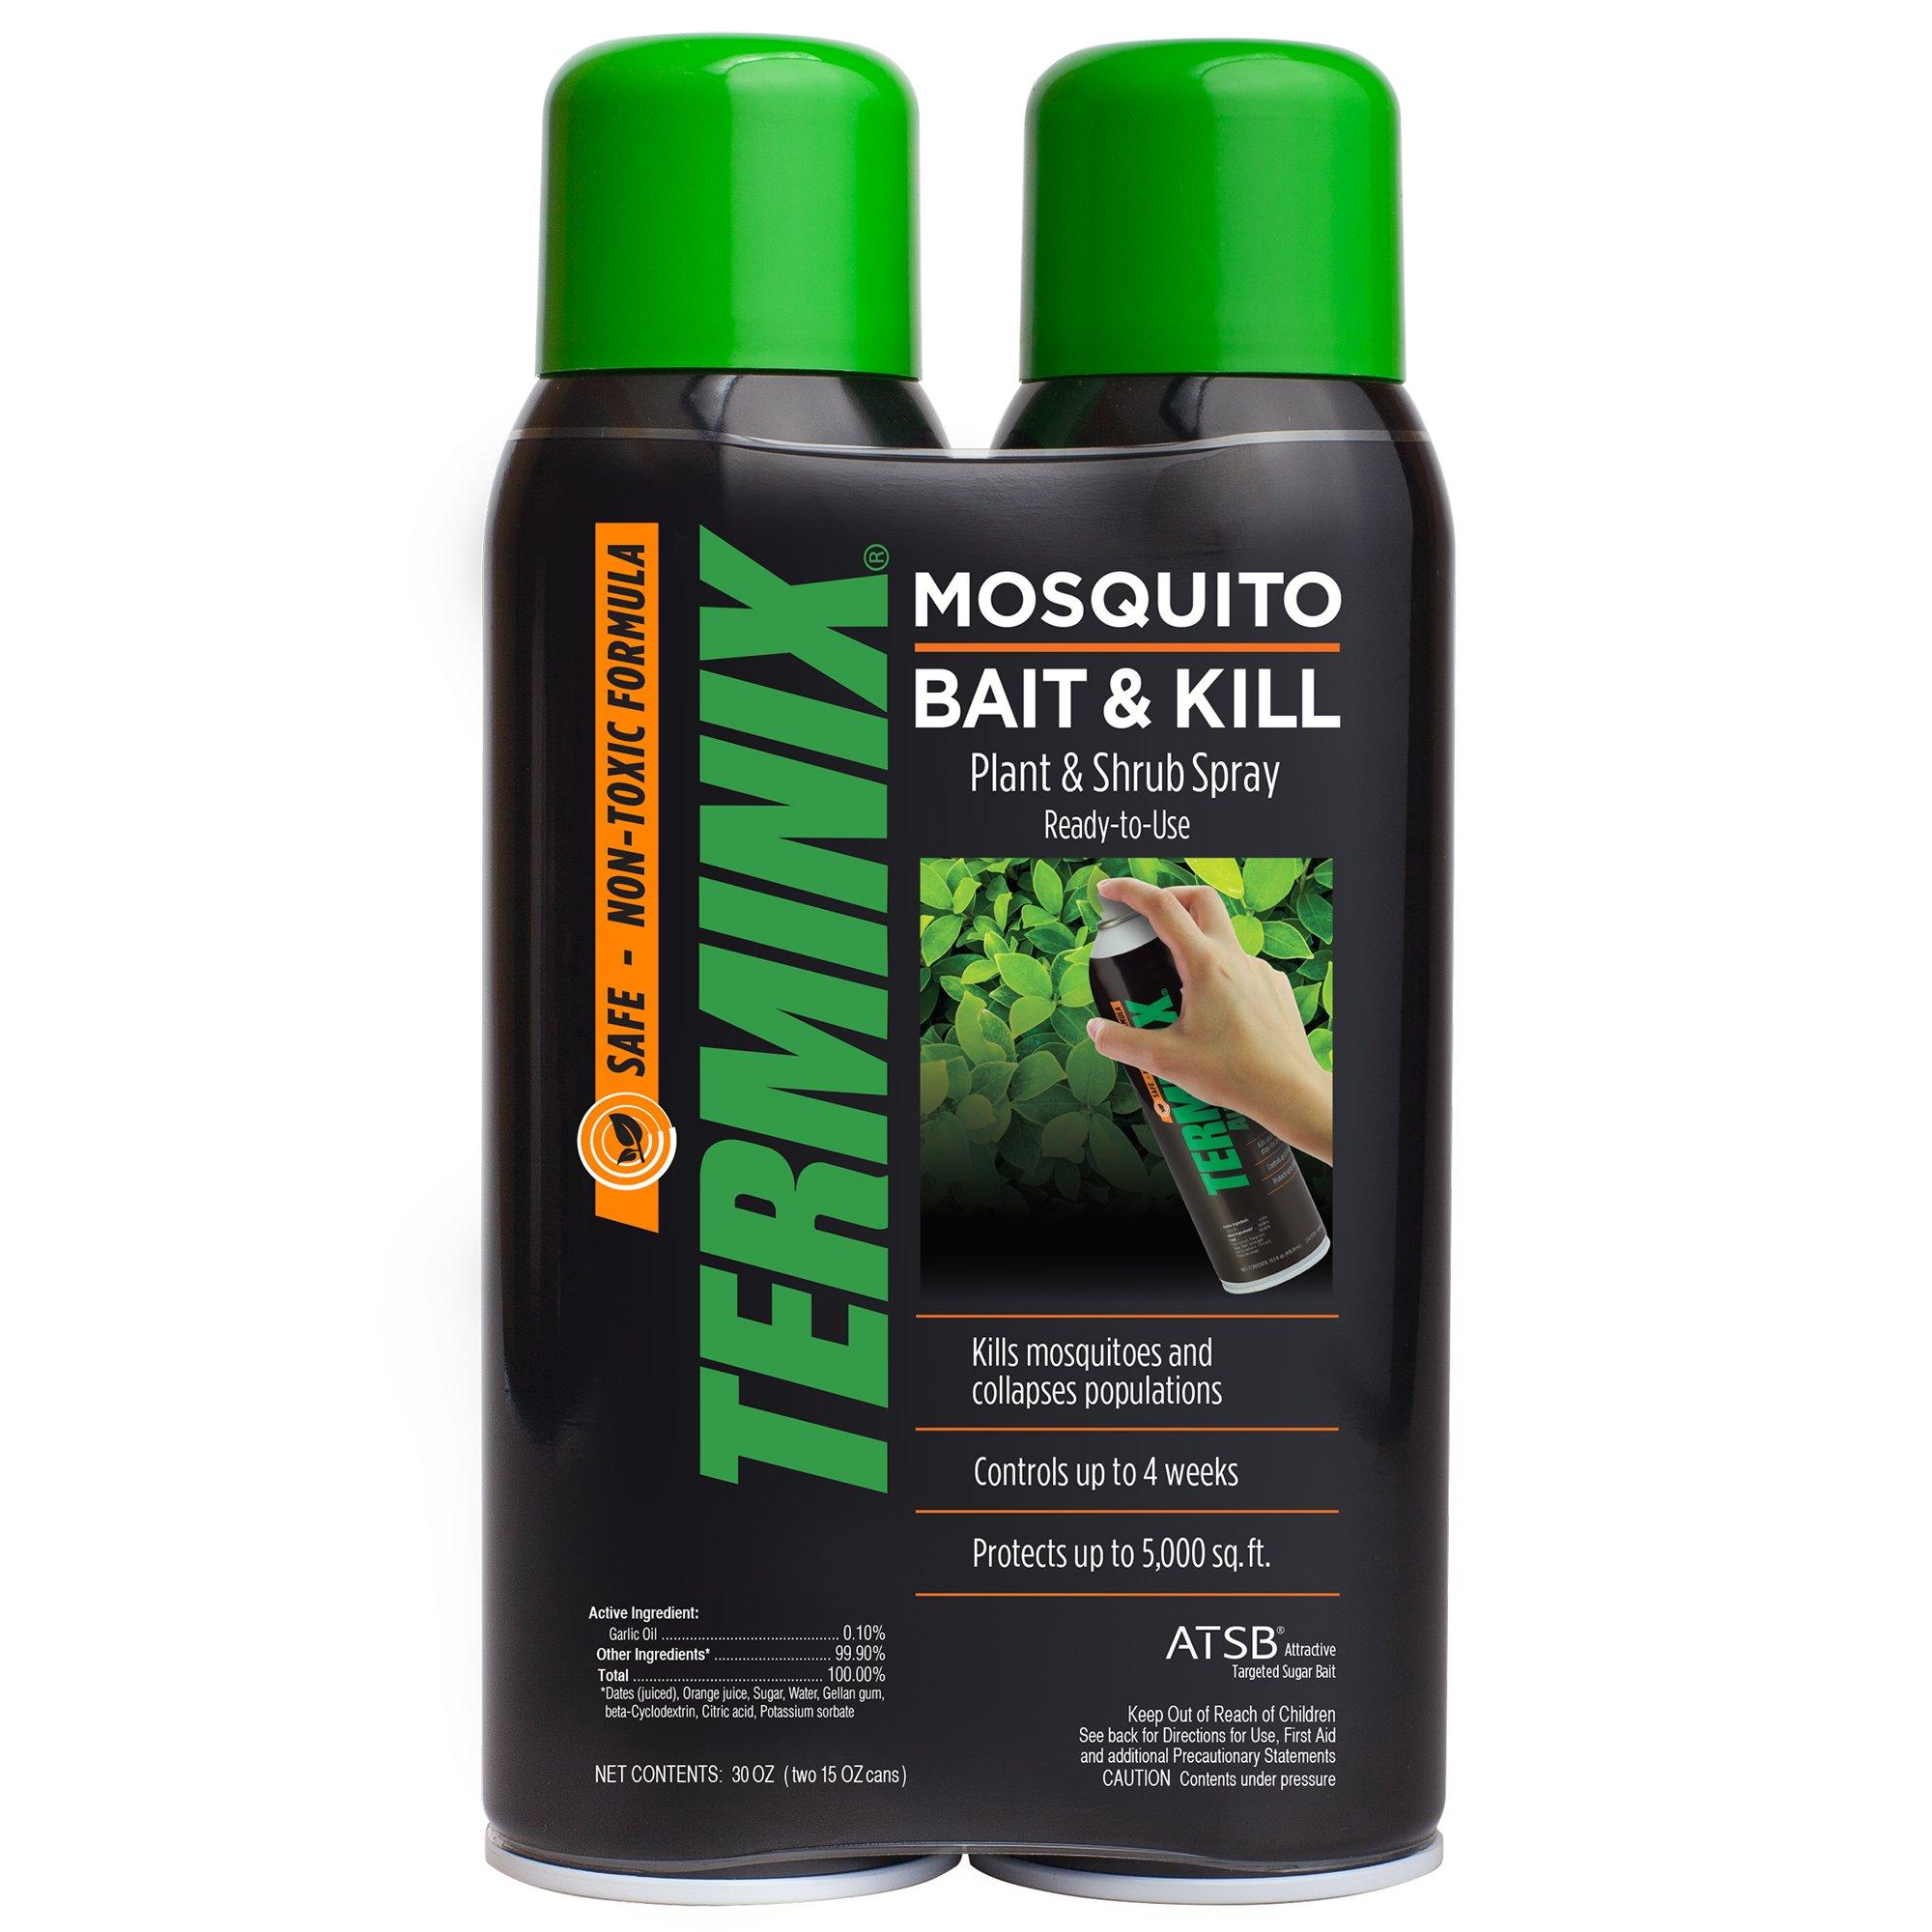 Terminix Atsb200 Mosquito Bait Kill N Buy Online In Fiji At Desertcart